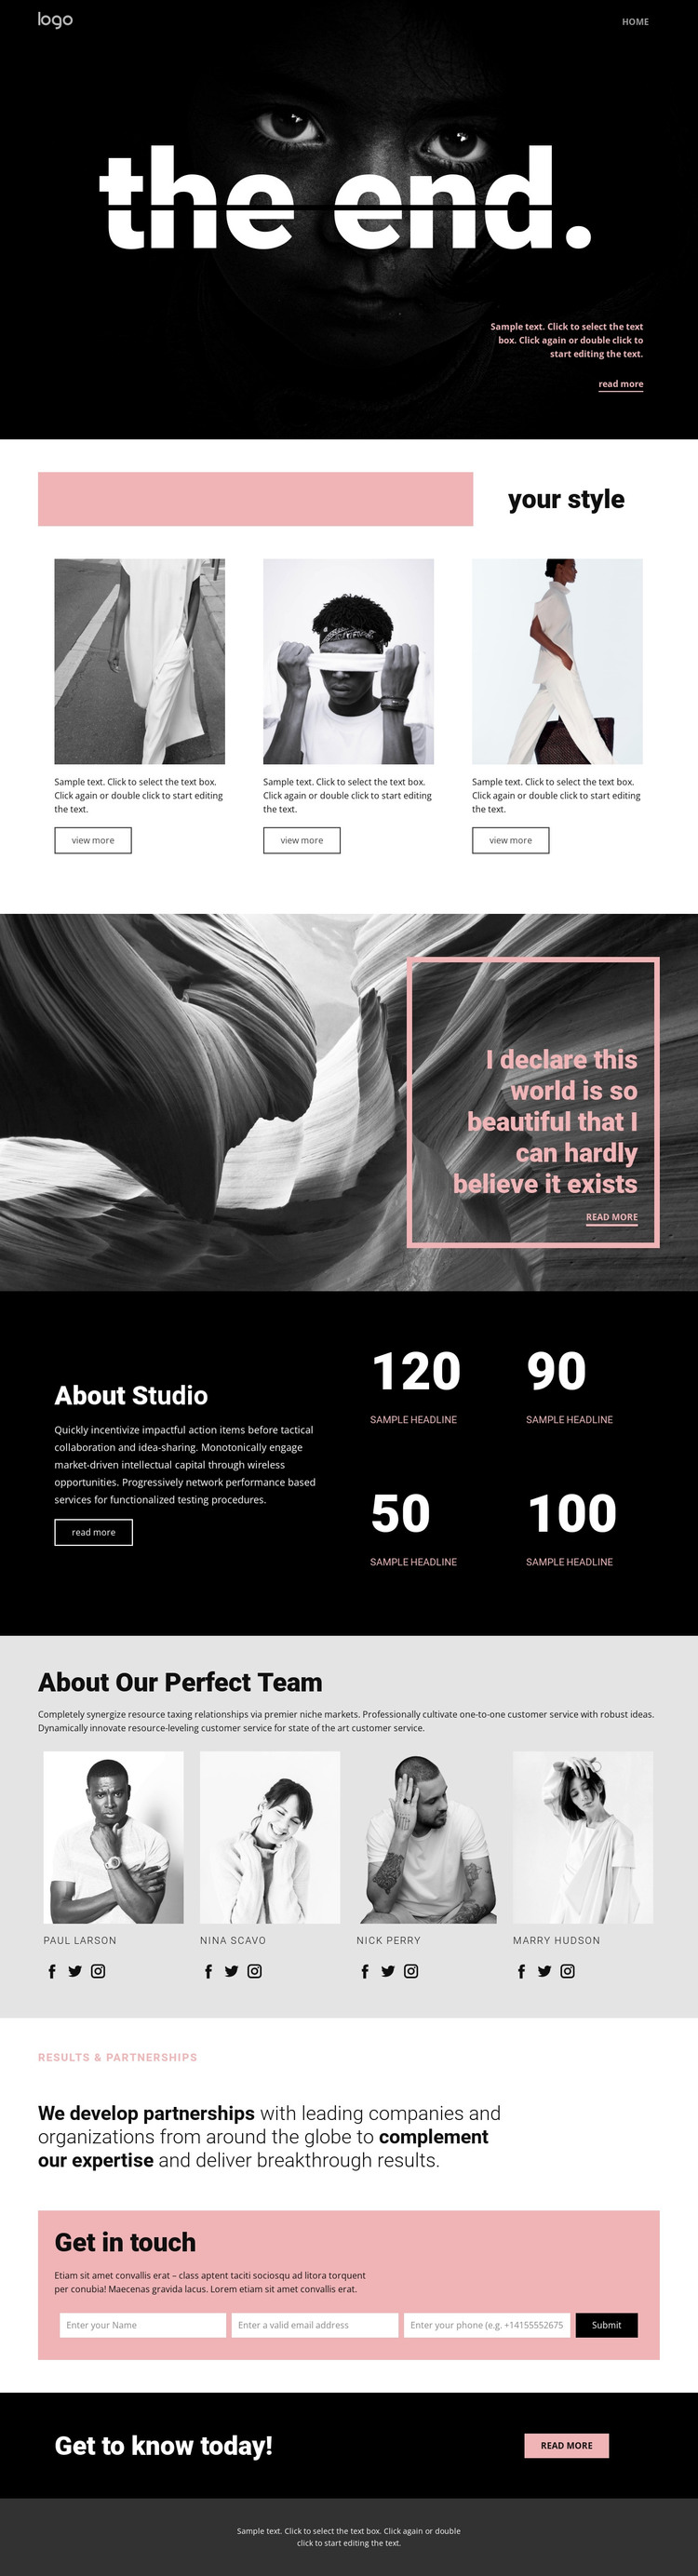 Perfecting styles of art Web Design